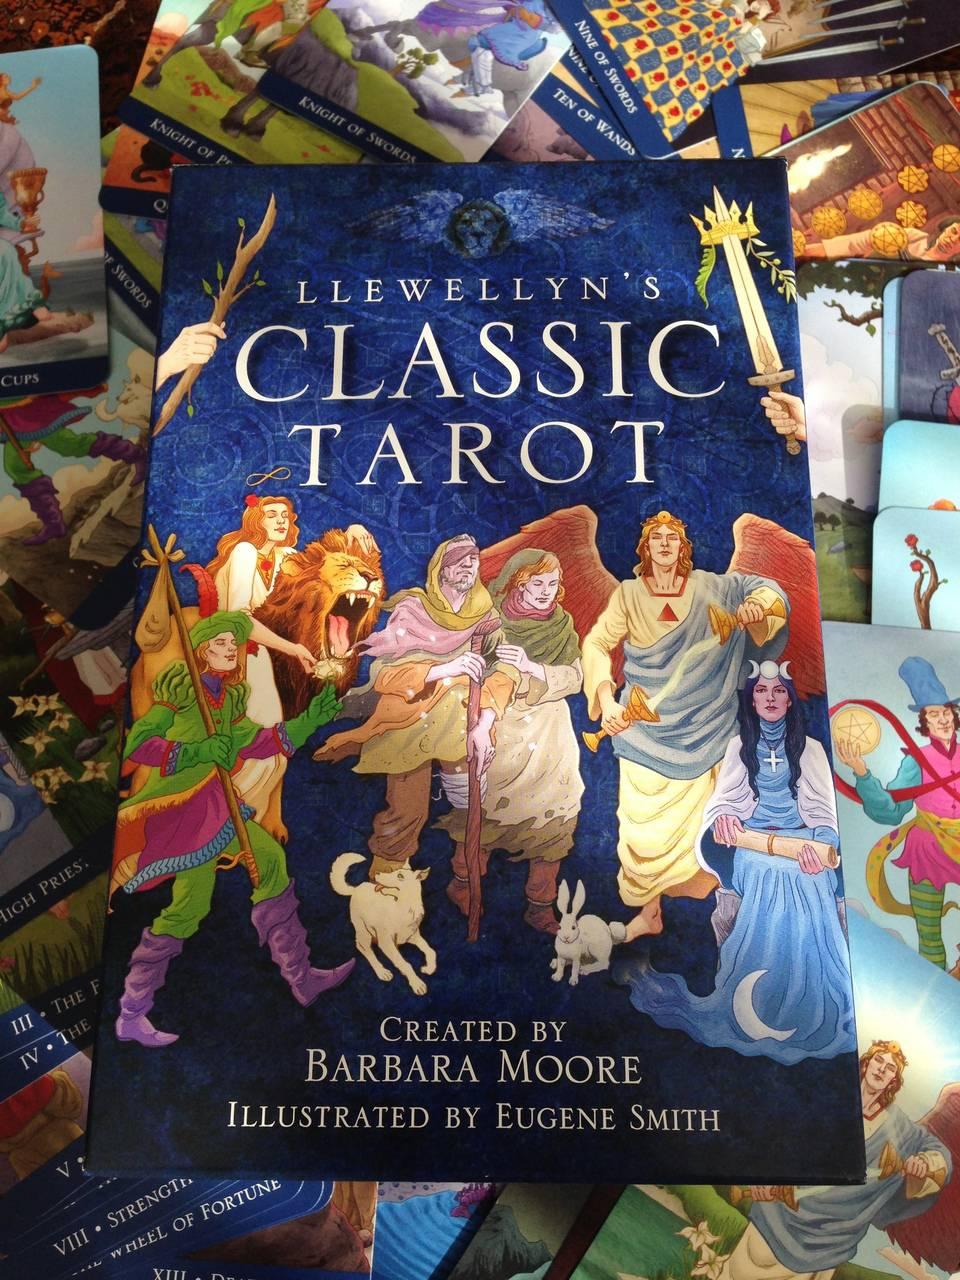 Llewellyn's Classic Tarot created by Barbara Moore